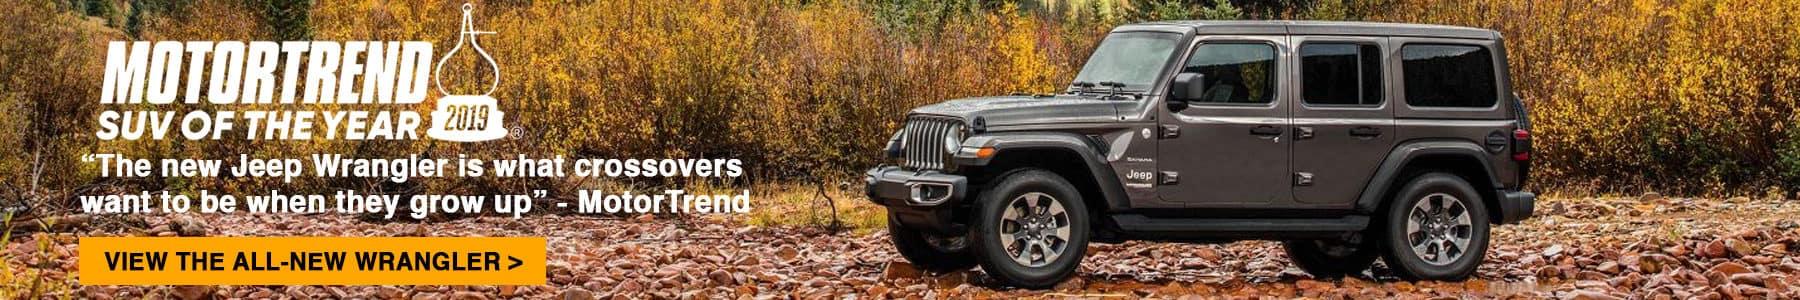 Jeep Wrangler Motortrend 2019